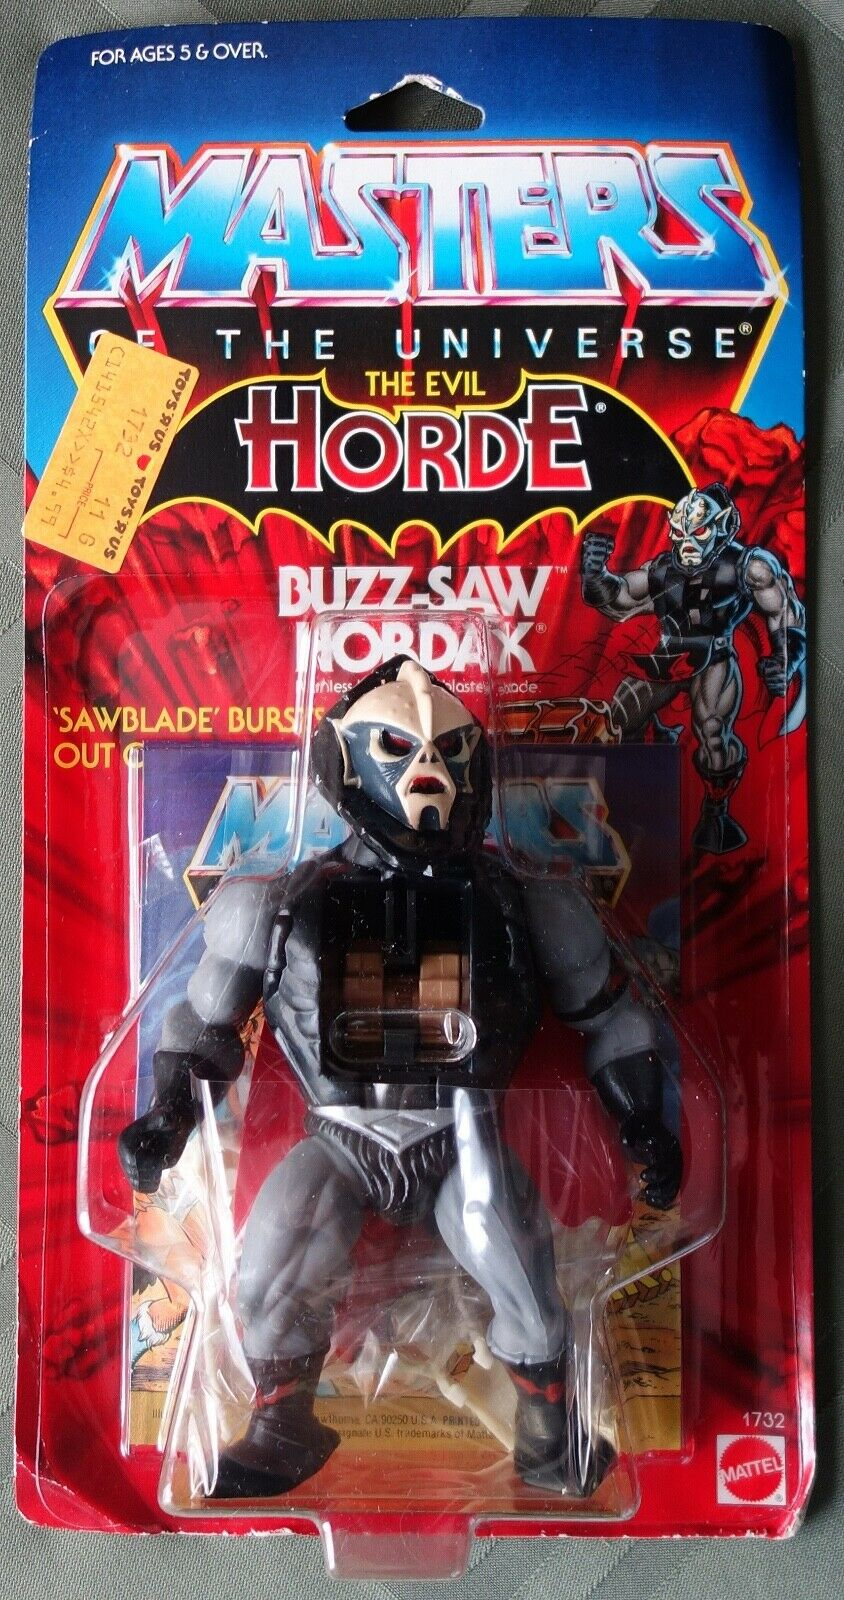 BUZZ-SAW HORDAK  Ruthless Leader with Blaster Blade - 1986 - MOTU - Unopened